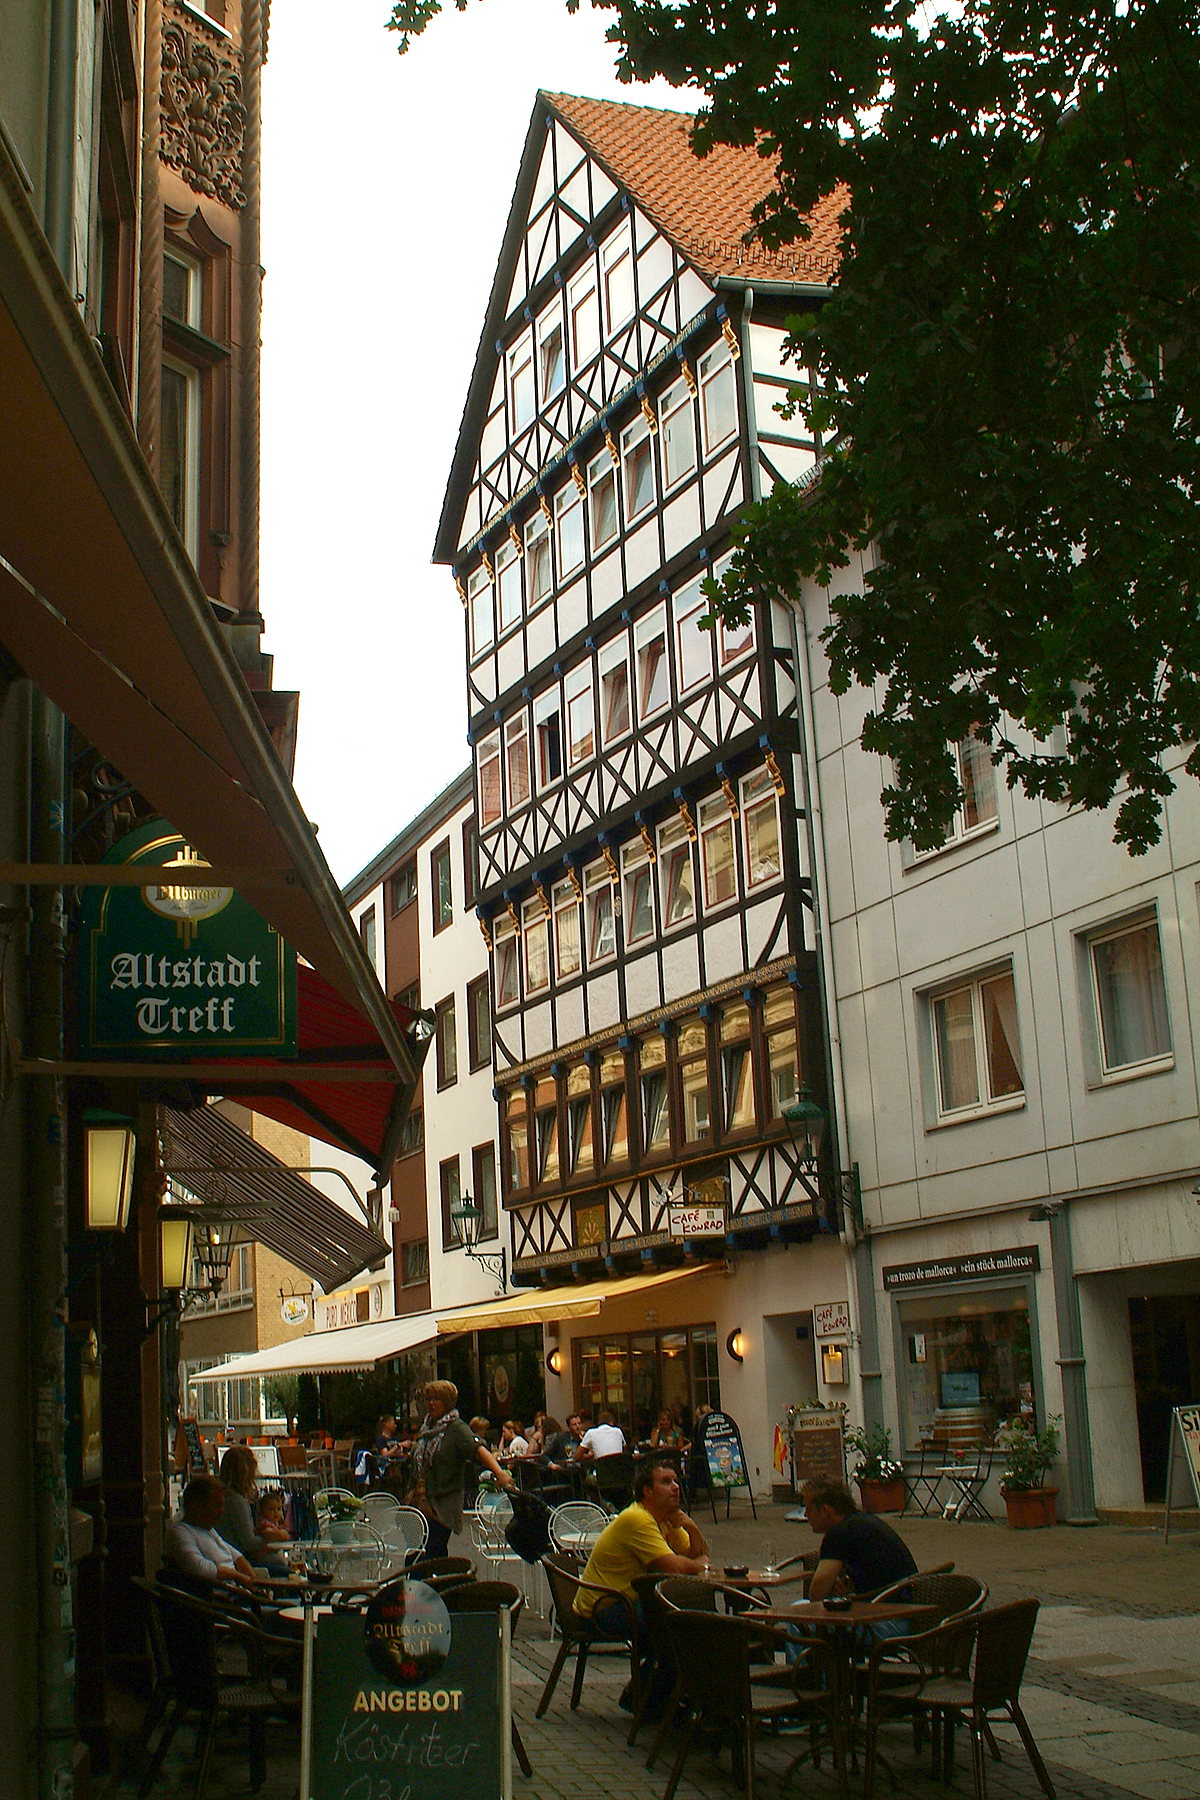 Adresse Caf De L Aube Troyes